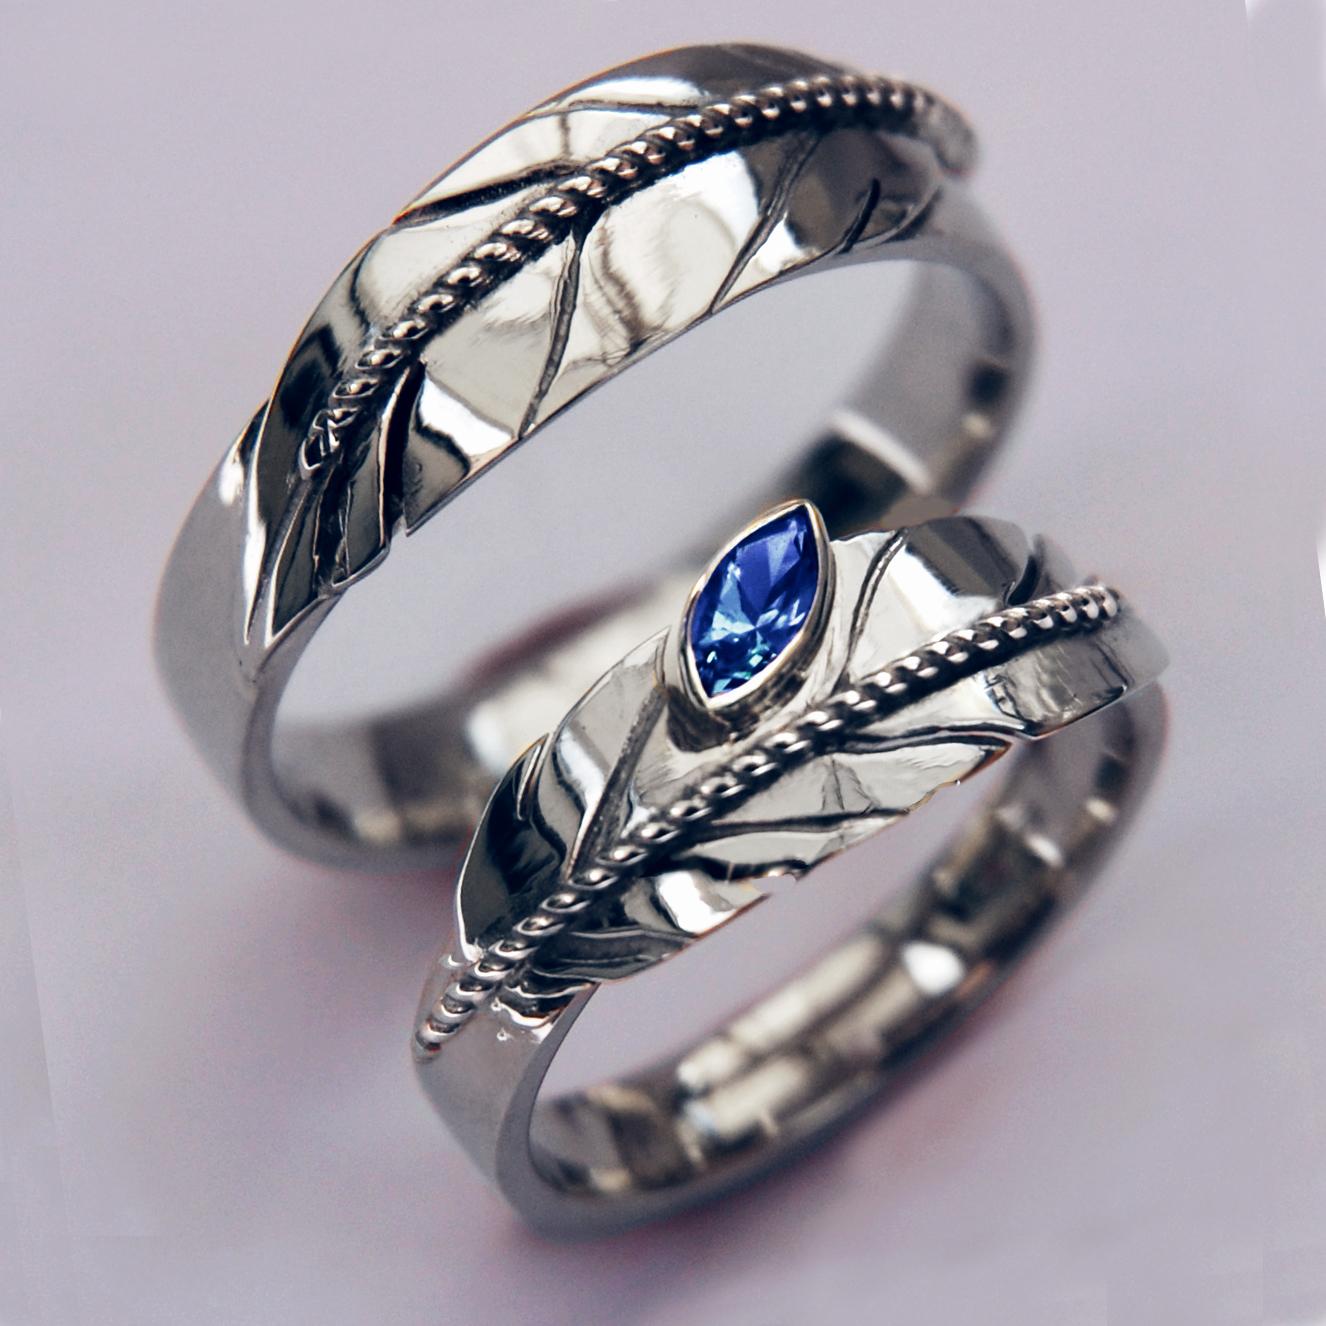 Nidebibinanimin Giizhig Midewiwin Eagle Feather Wedding Rings: Native American Wedding Ring Designs At Websimilar.org